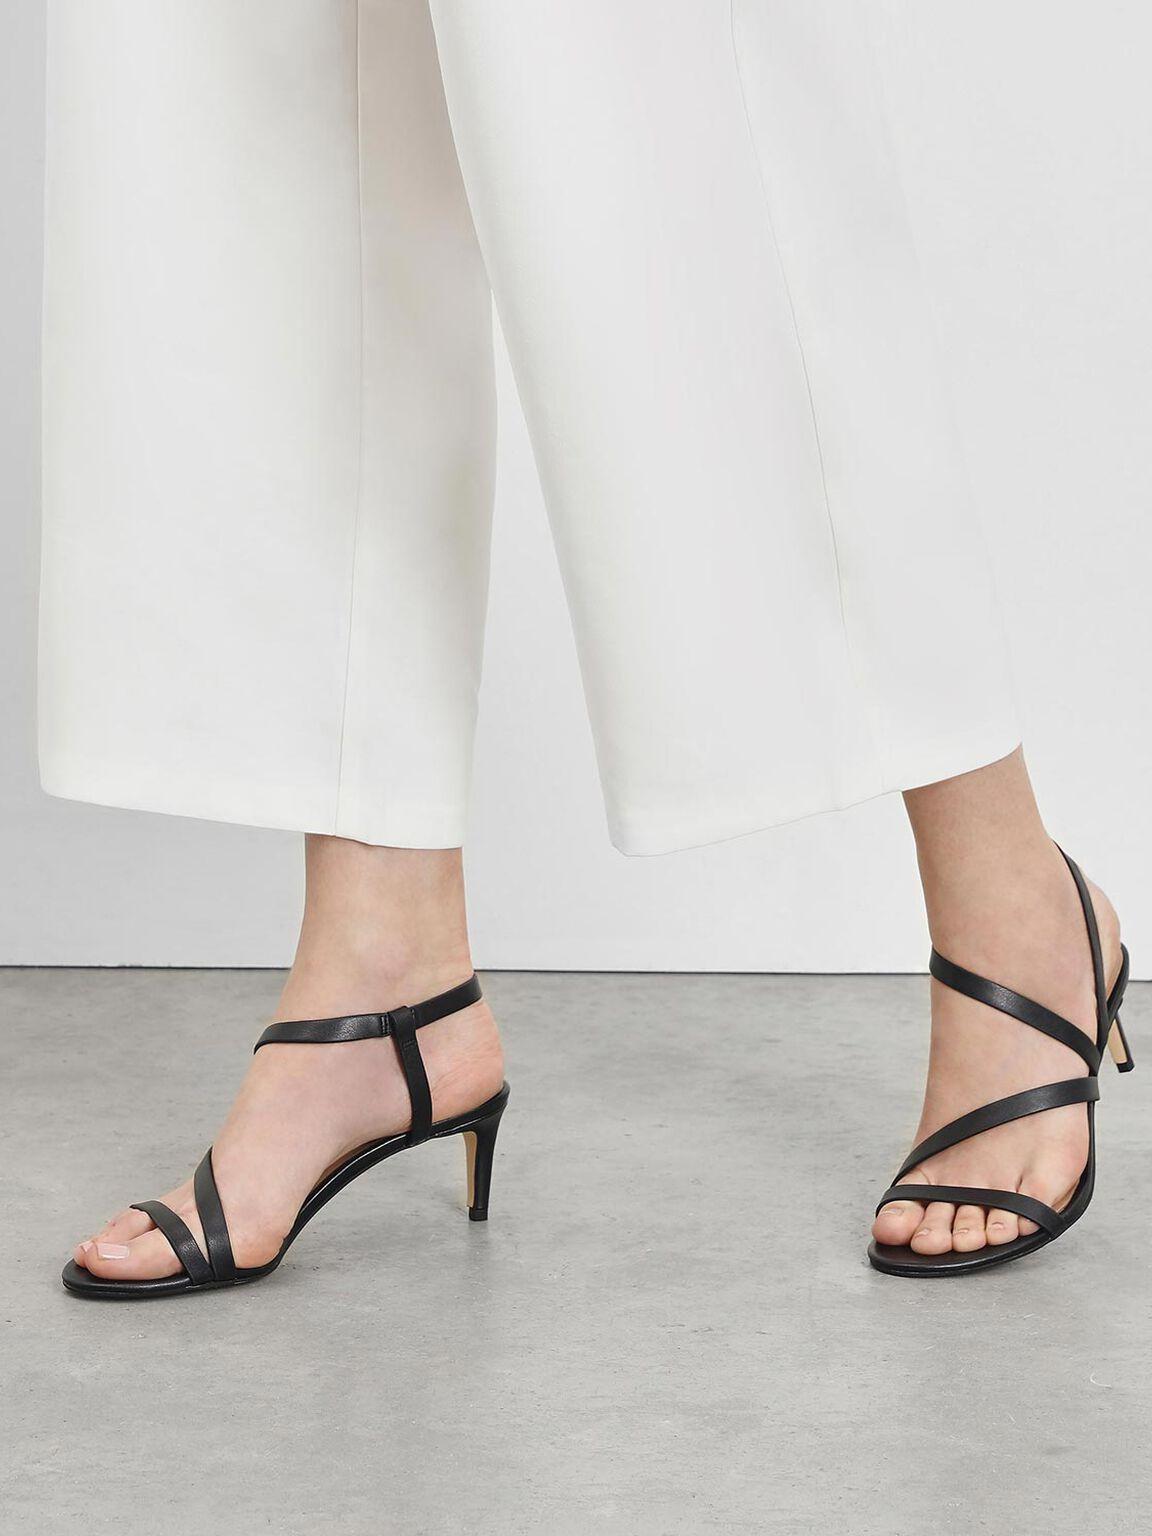 Open Toe Strappy Sandals, Black, hi-res